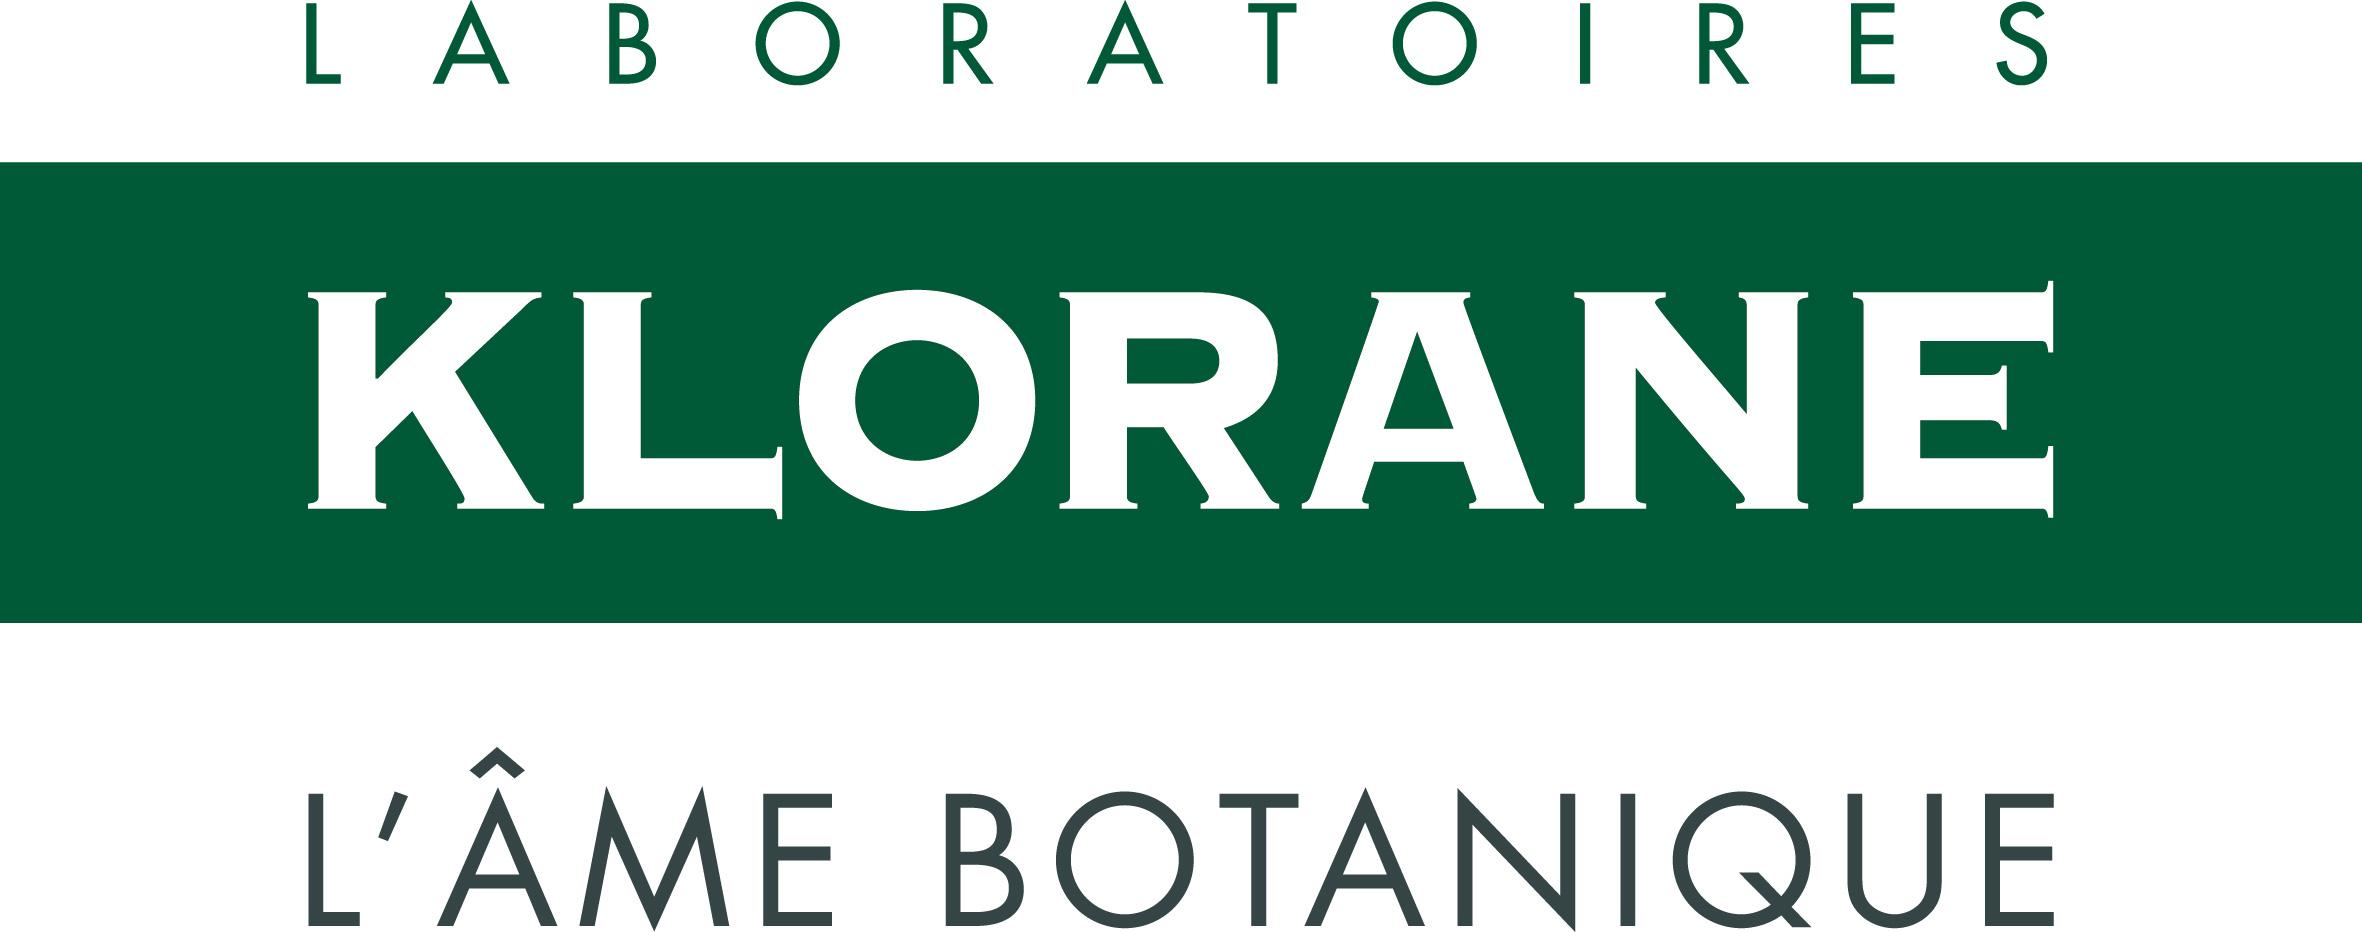 Klorane logo l ame botanique 2020 fr 4c